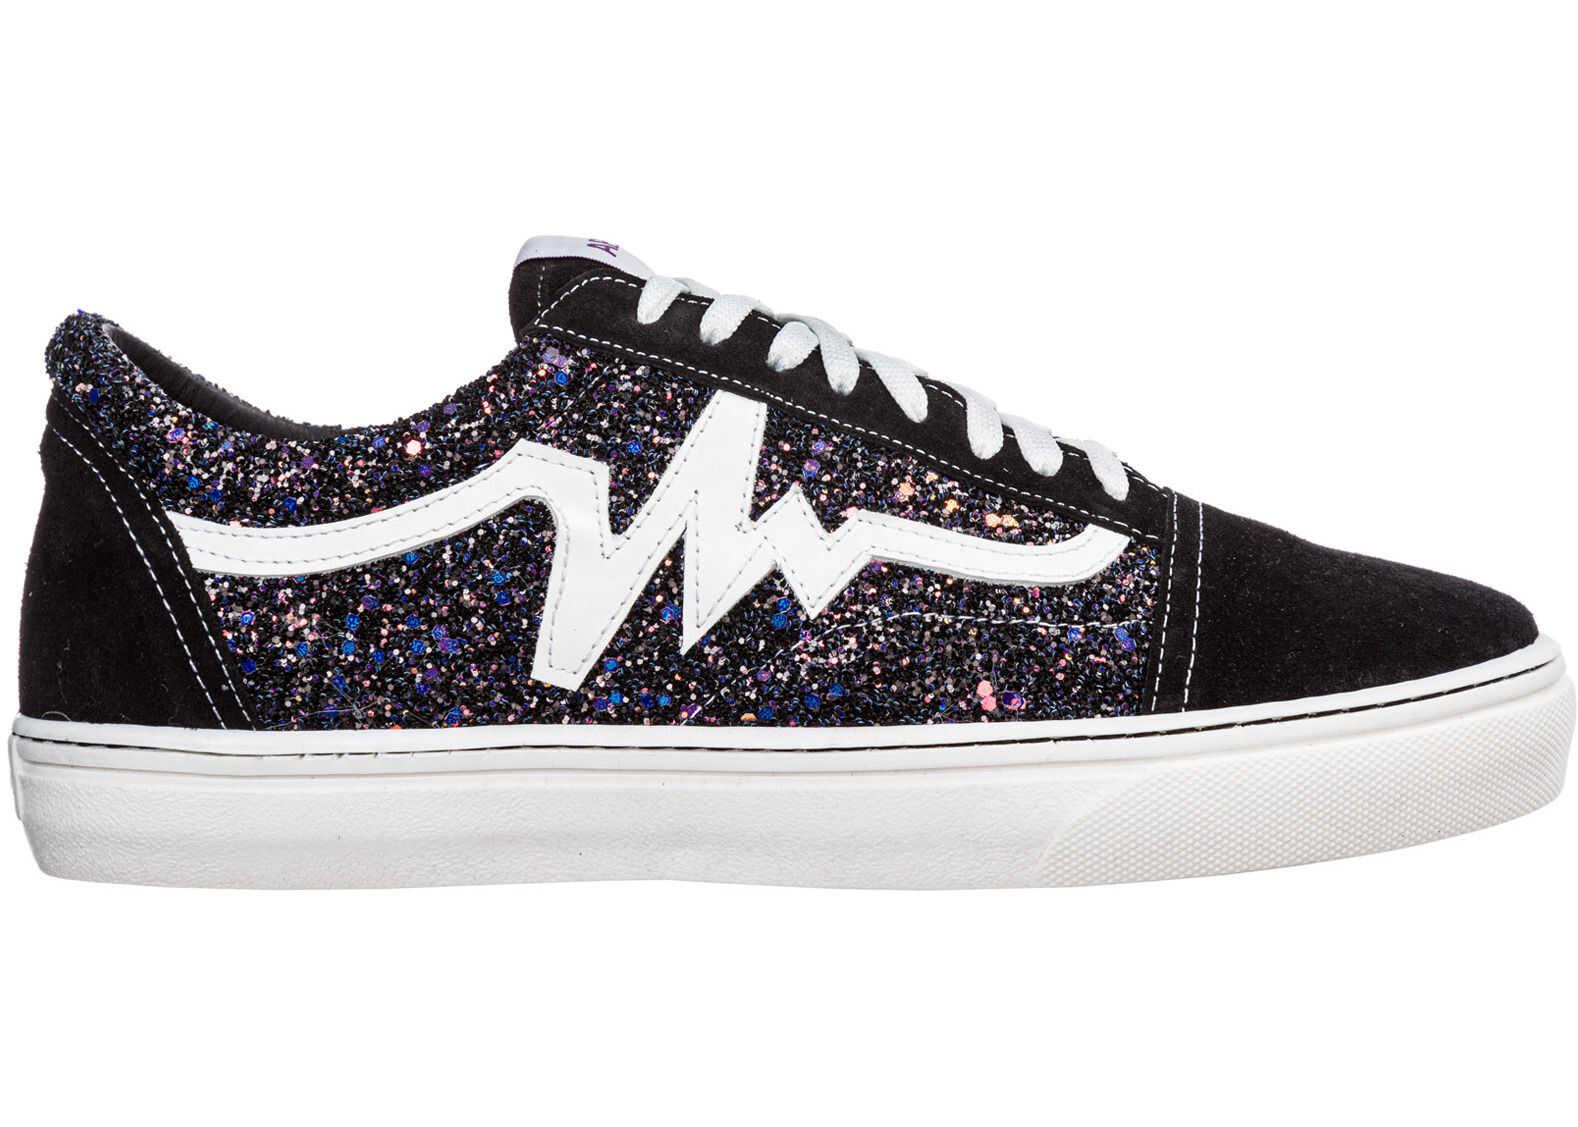 AP08 Sneakers Galaxi Black